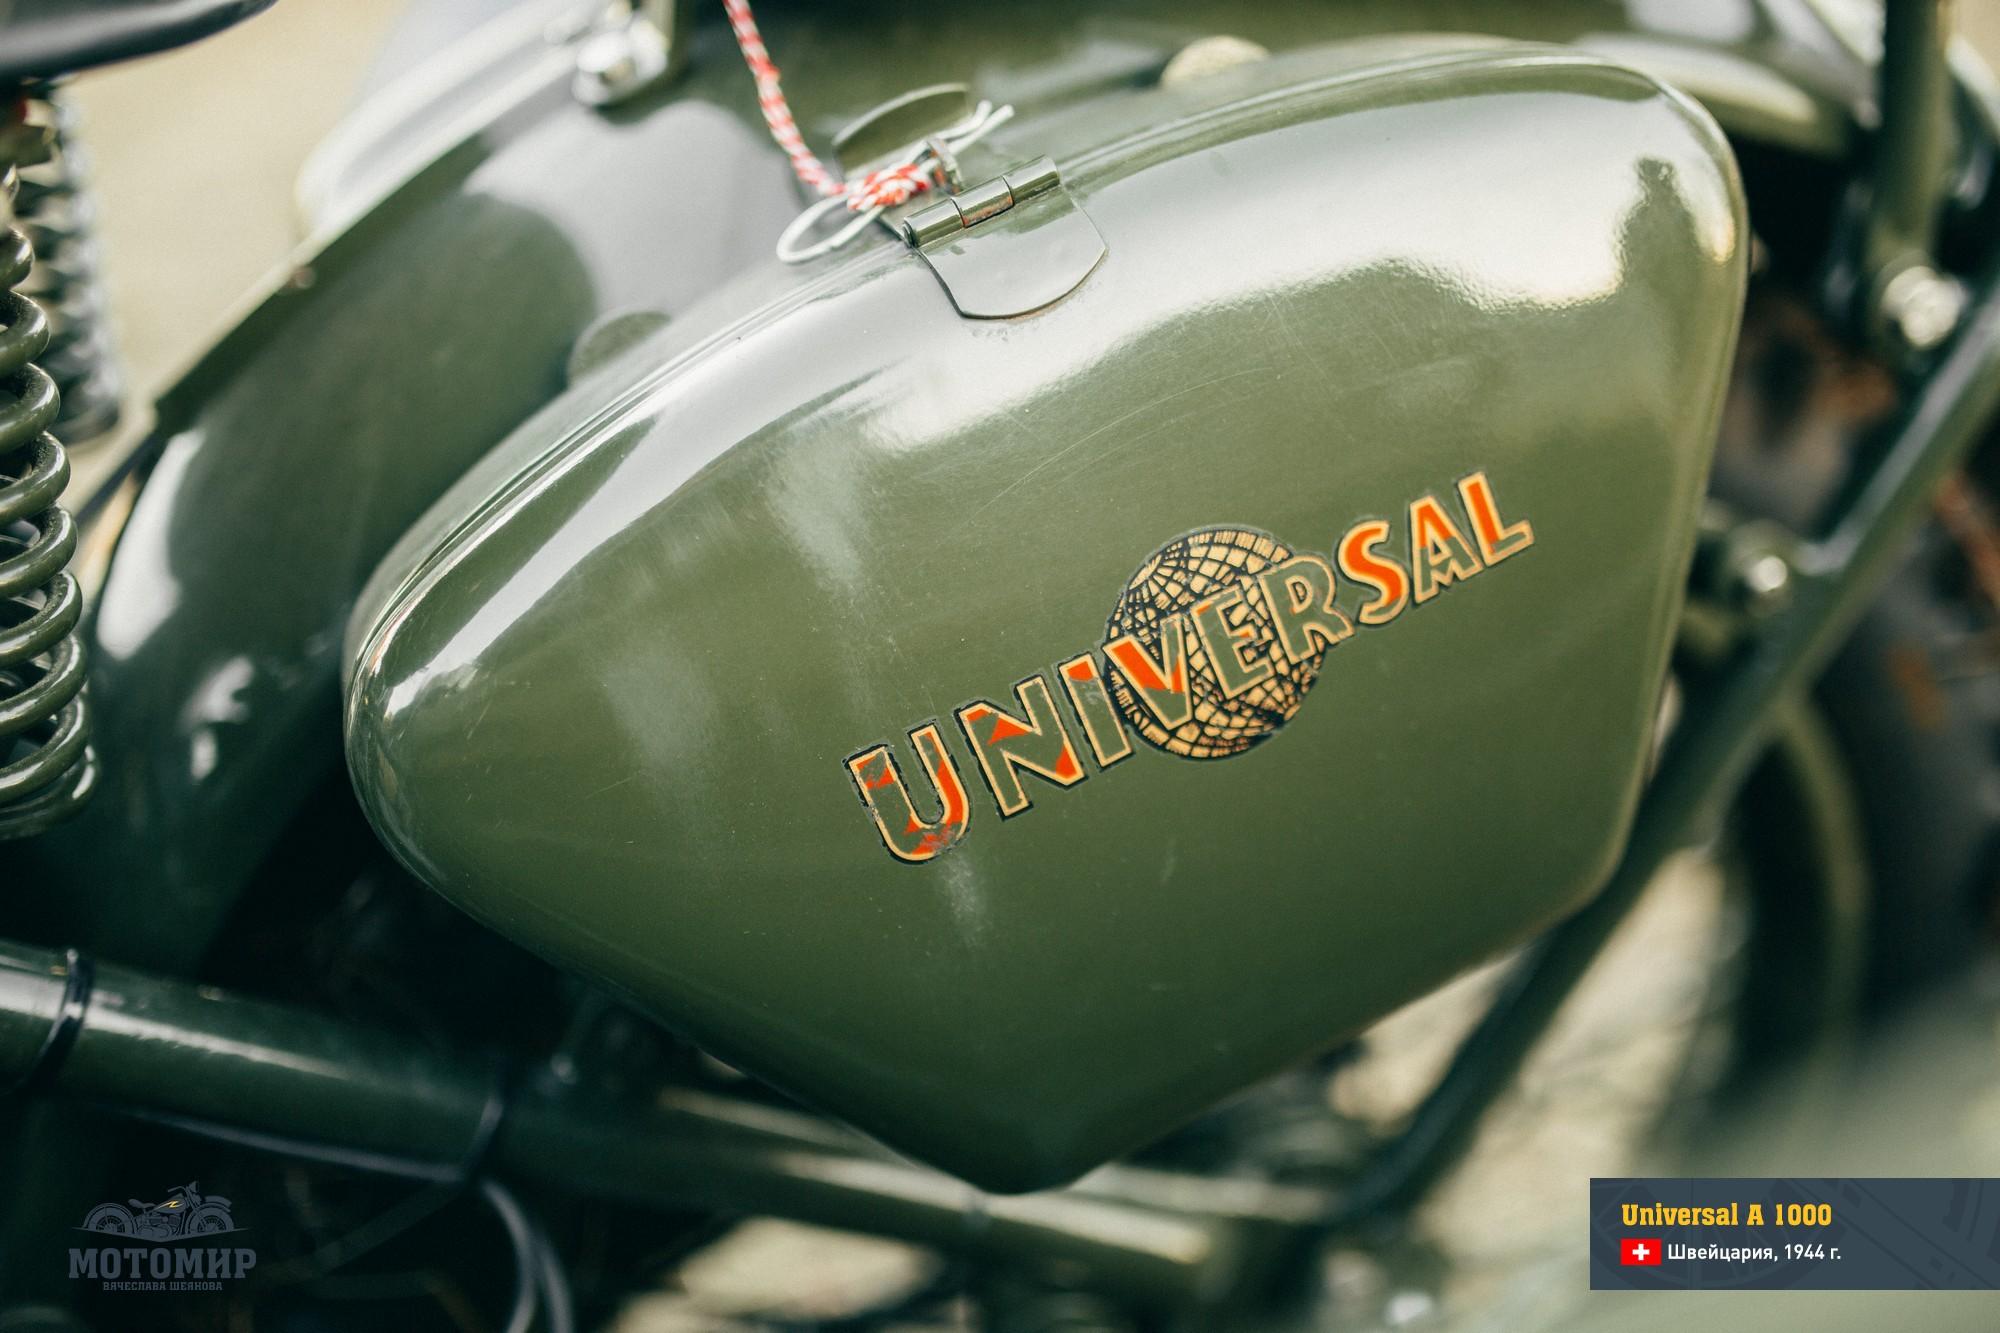 universal-a1000-201510-web-20